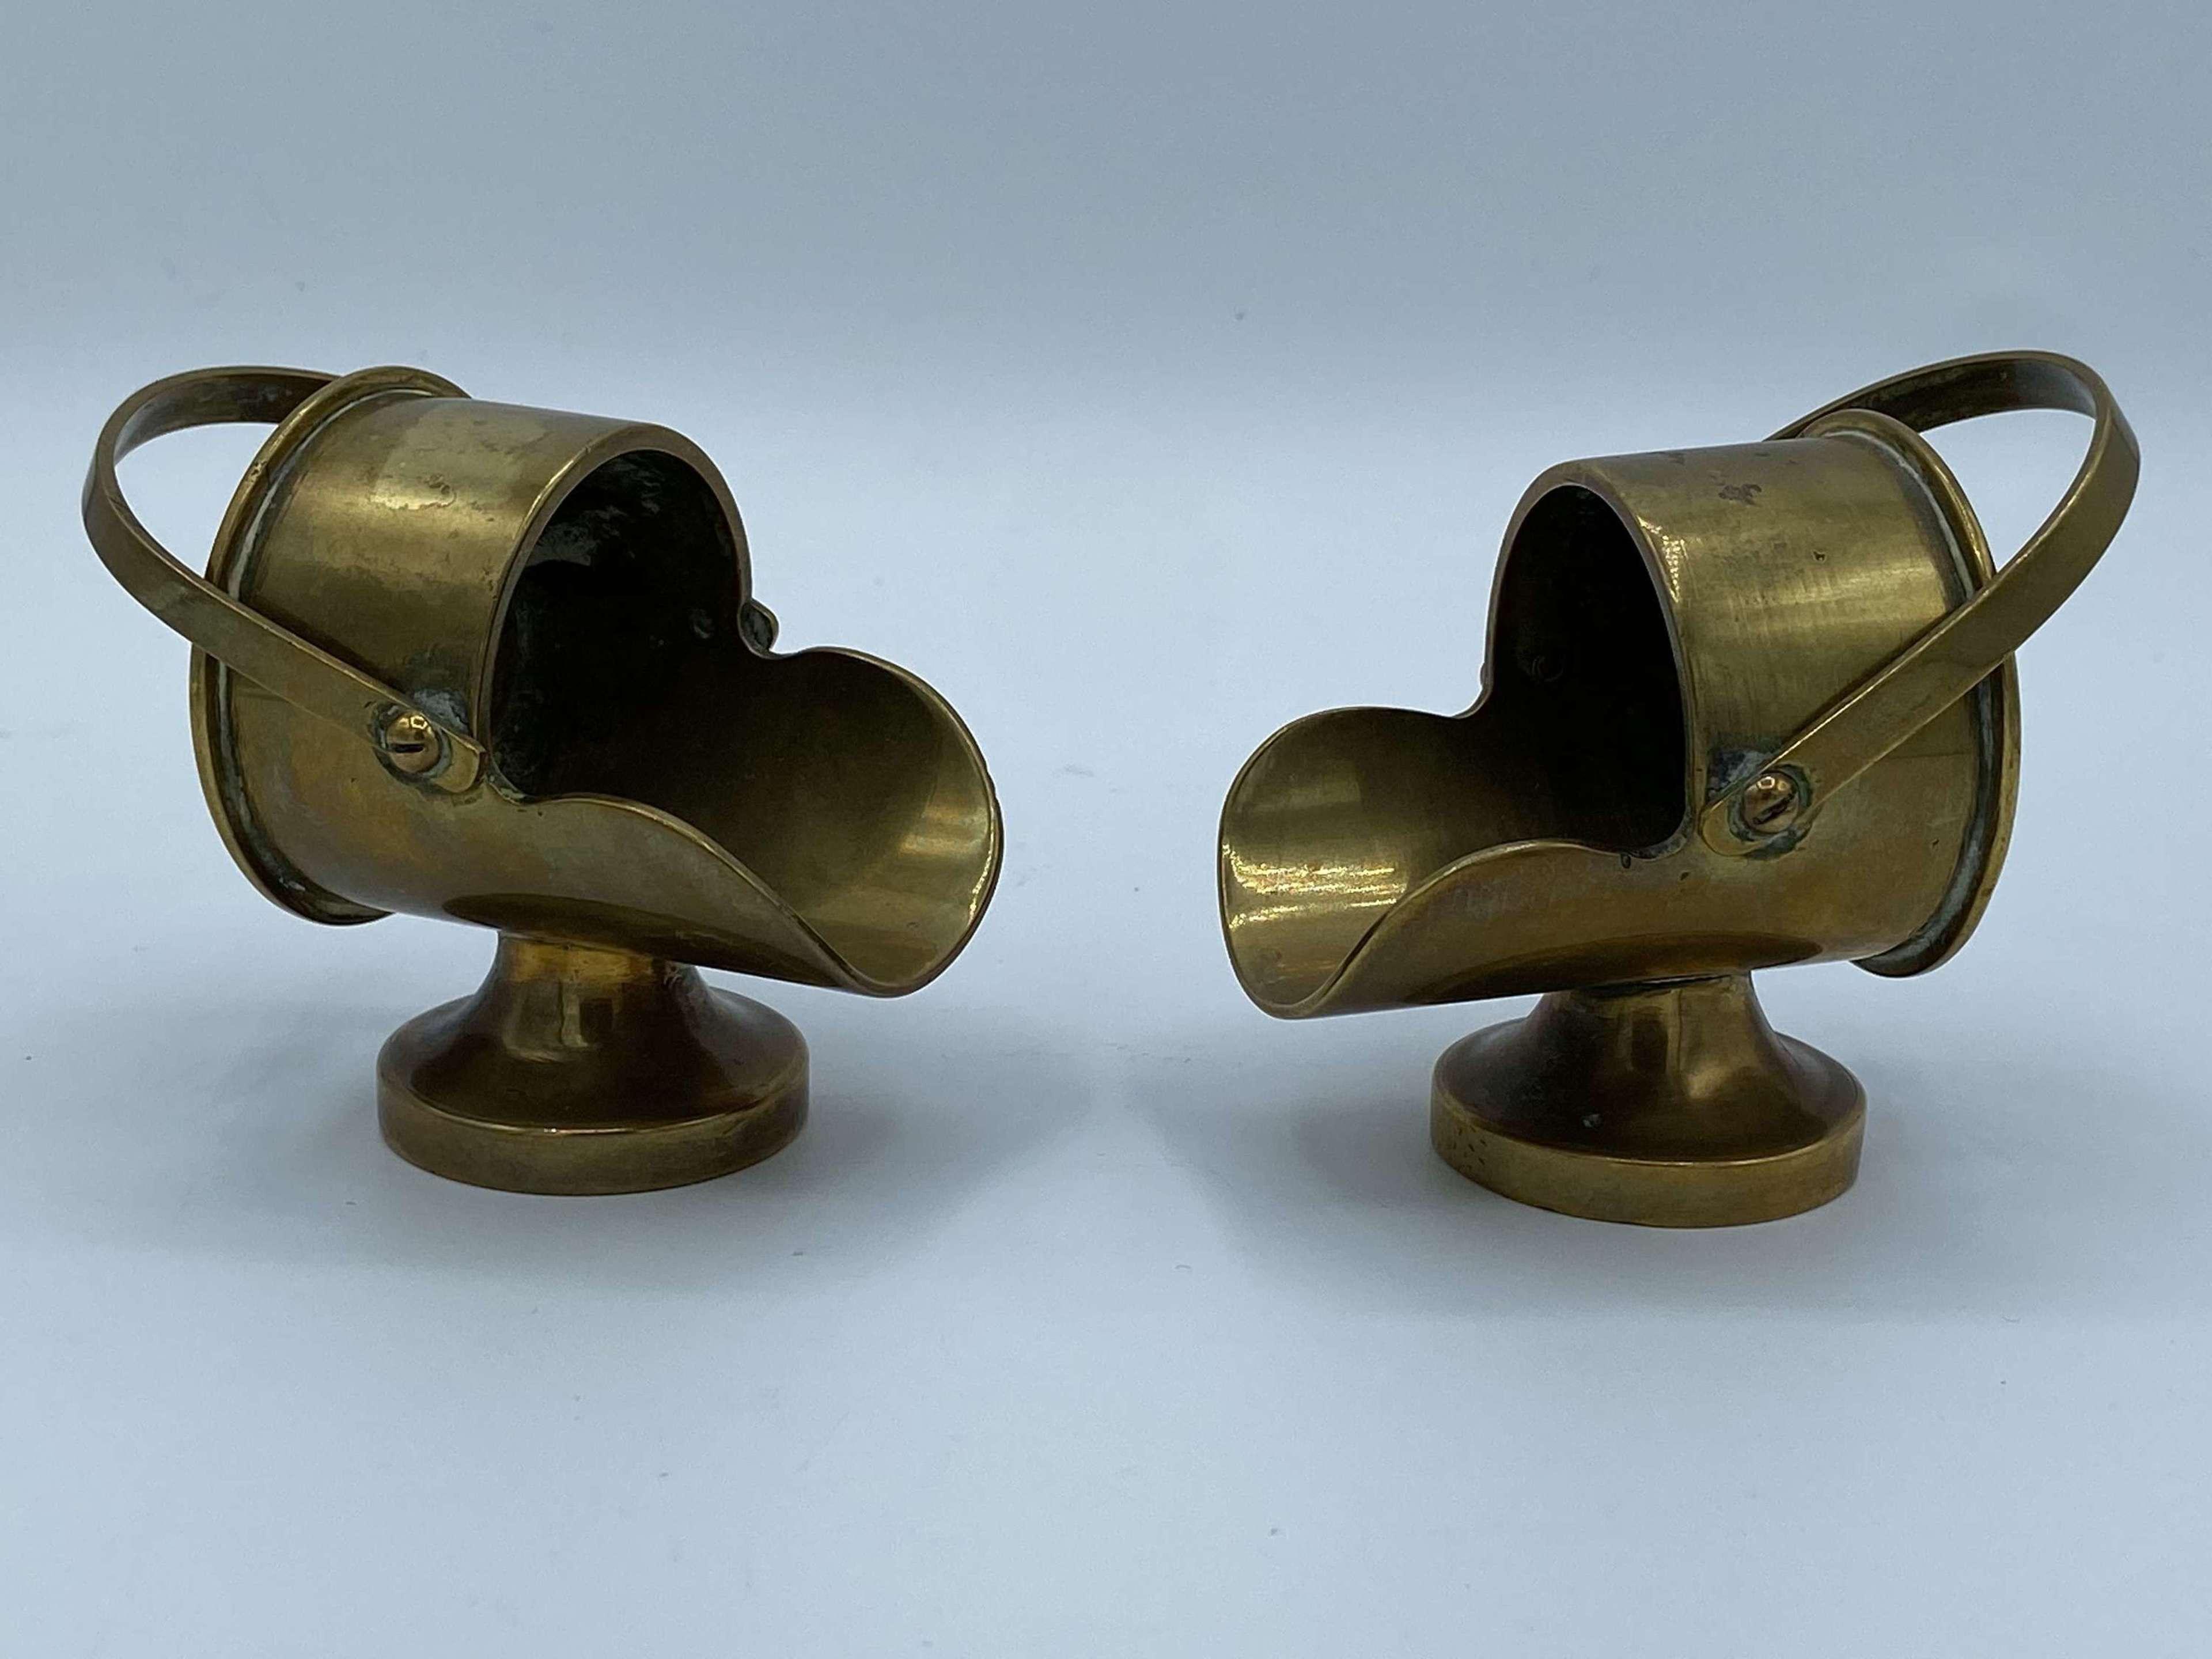 Pair Of WW1 British Brass Trench Art Brass Coal Scuttles